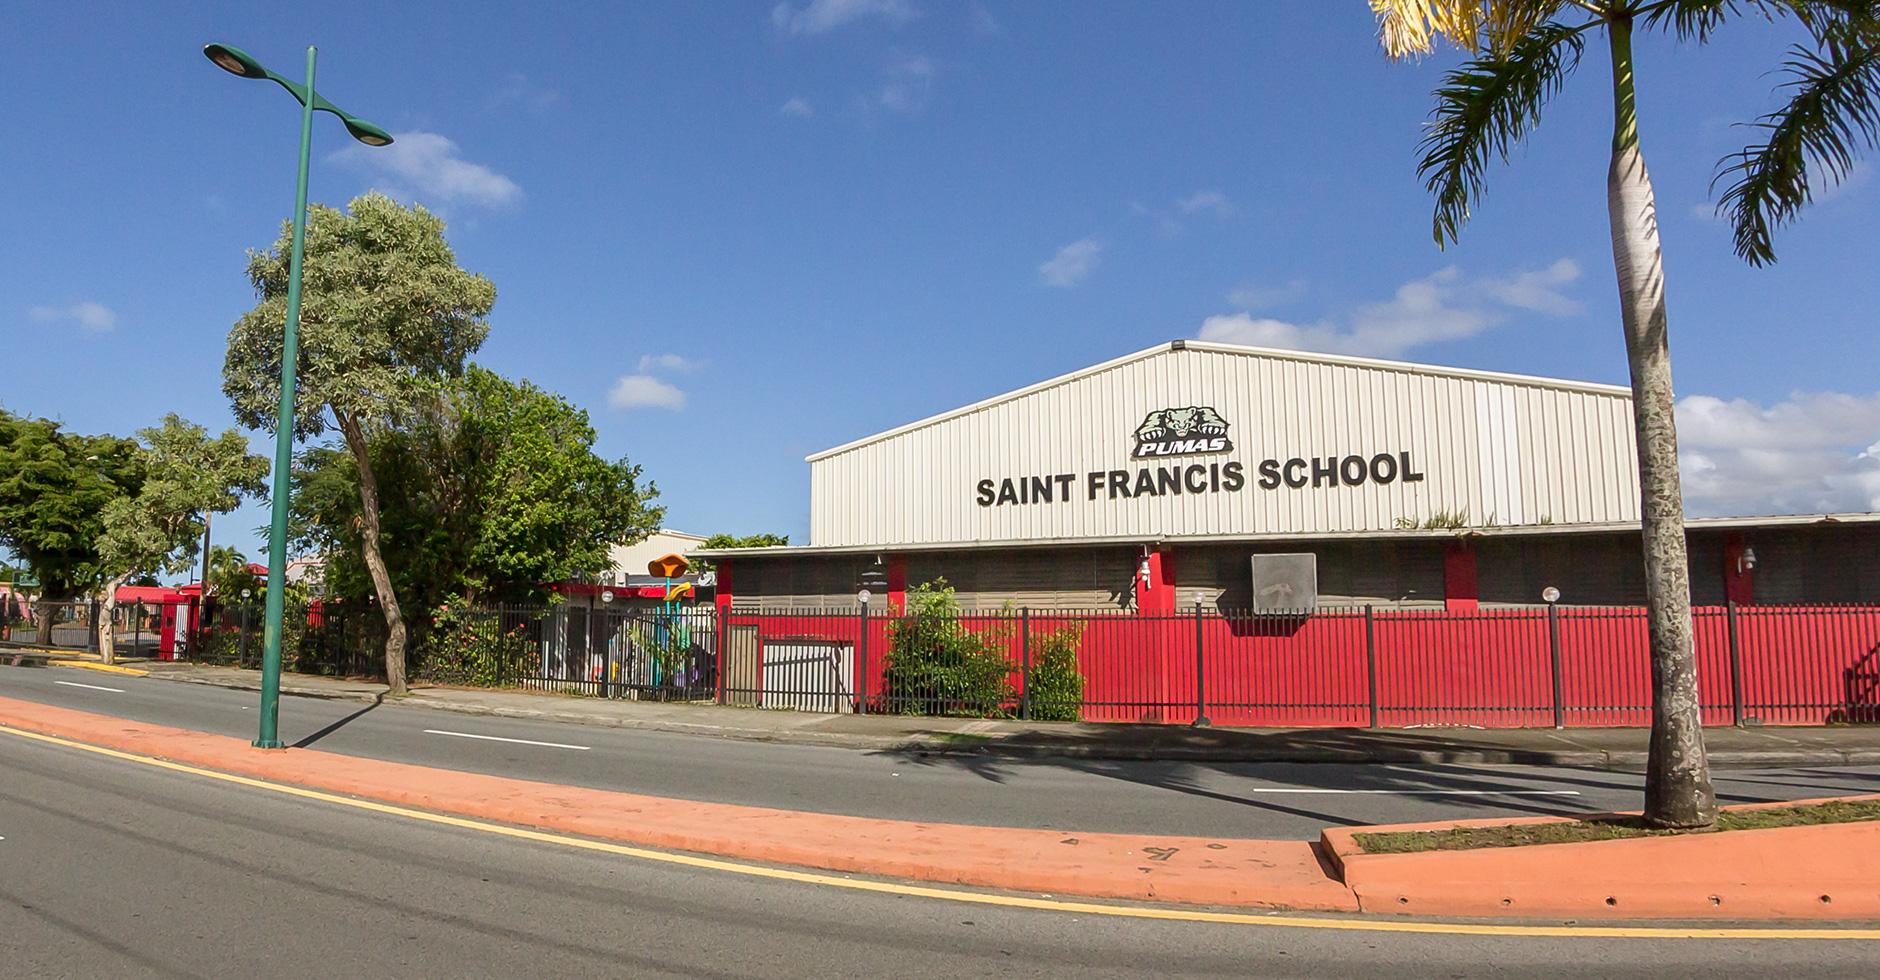 Saint Francis School